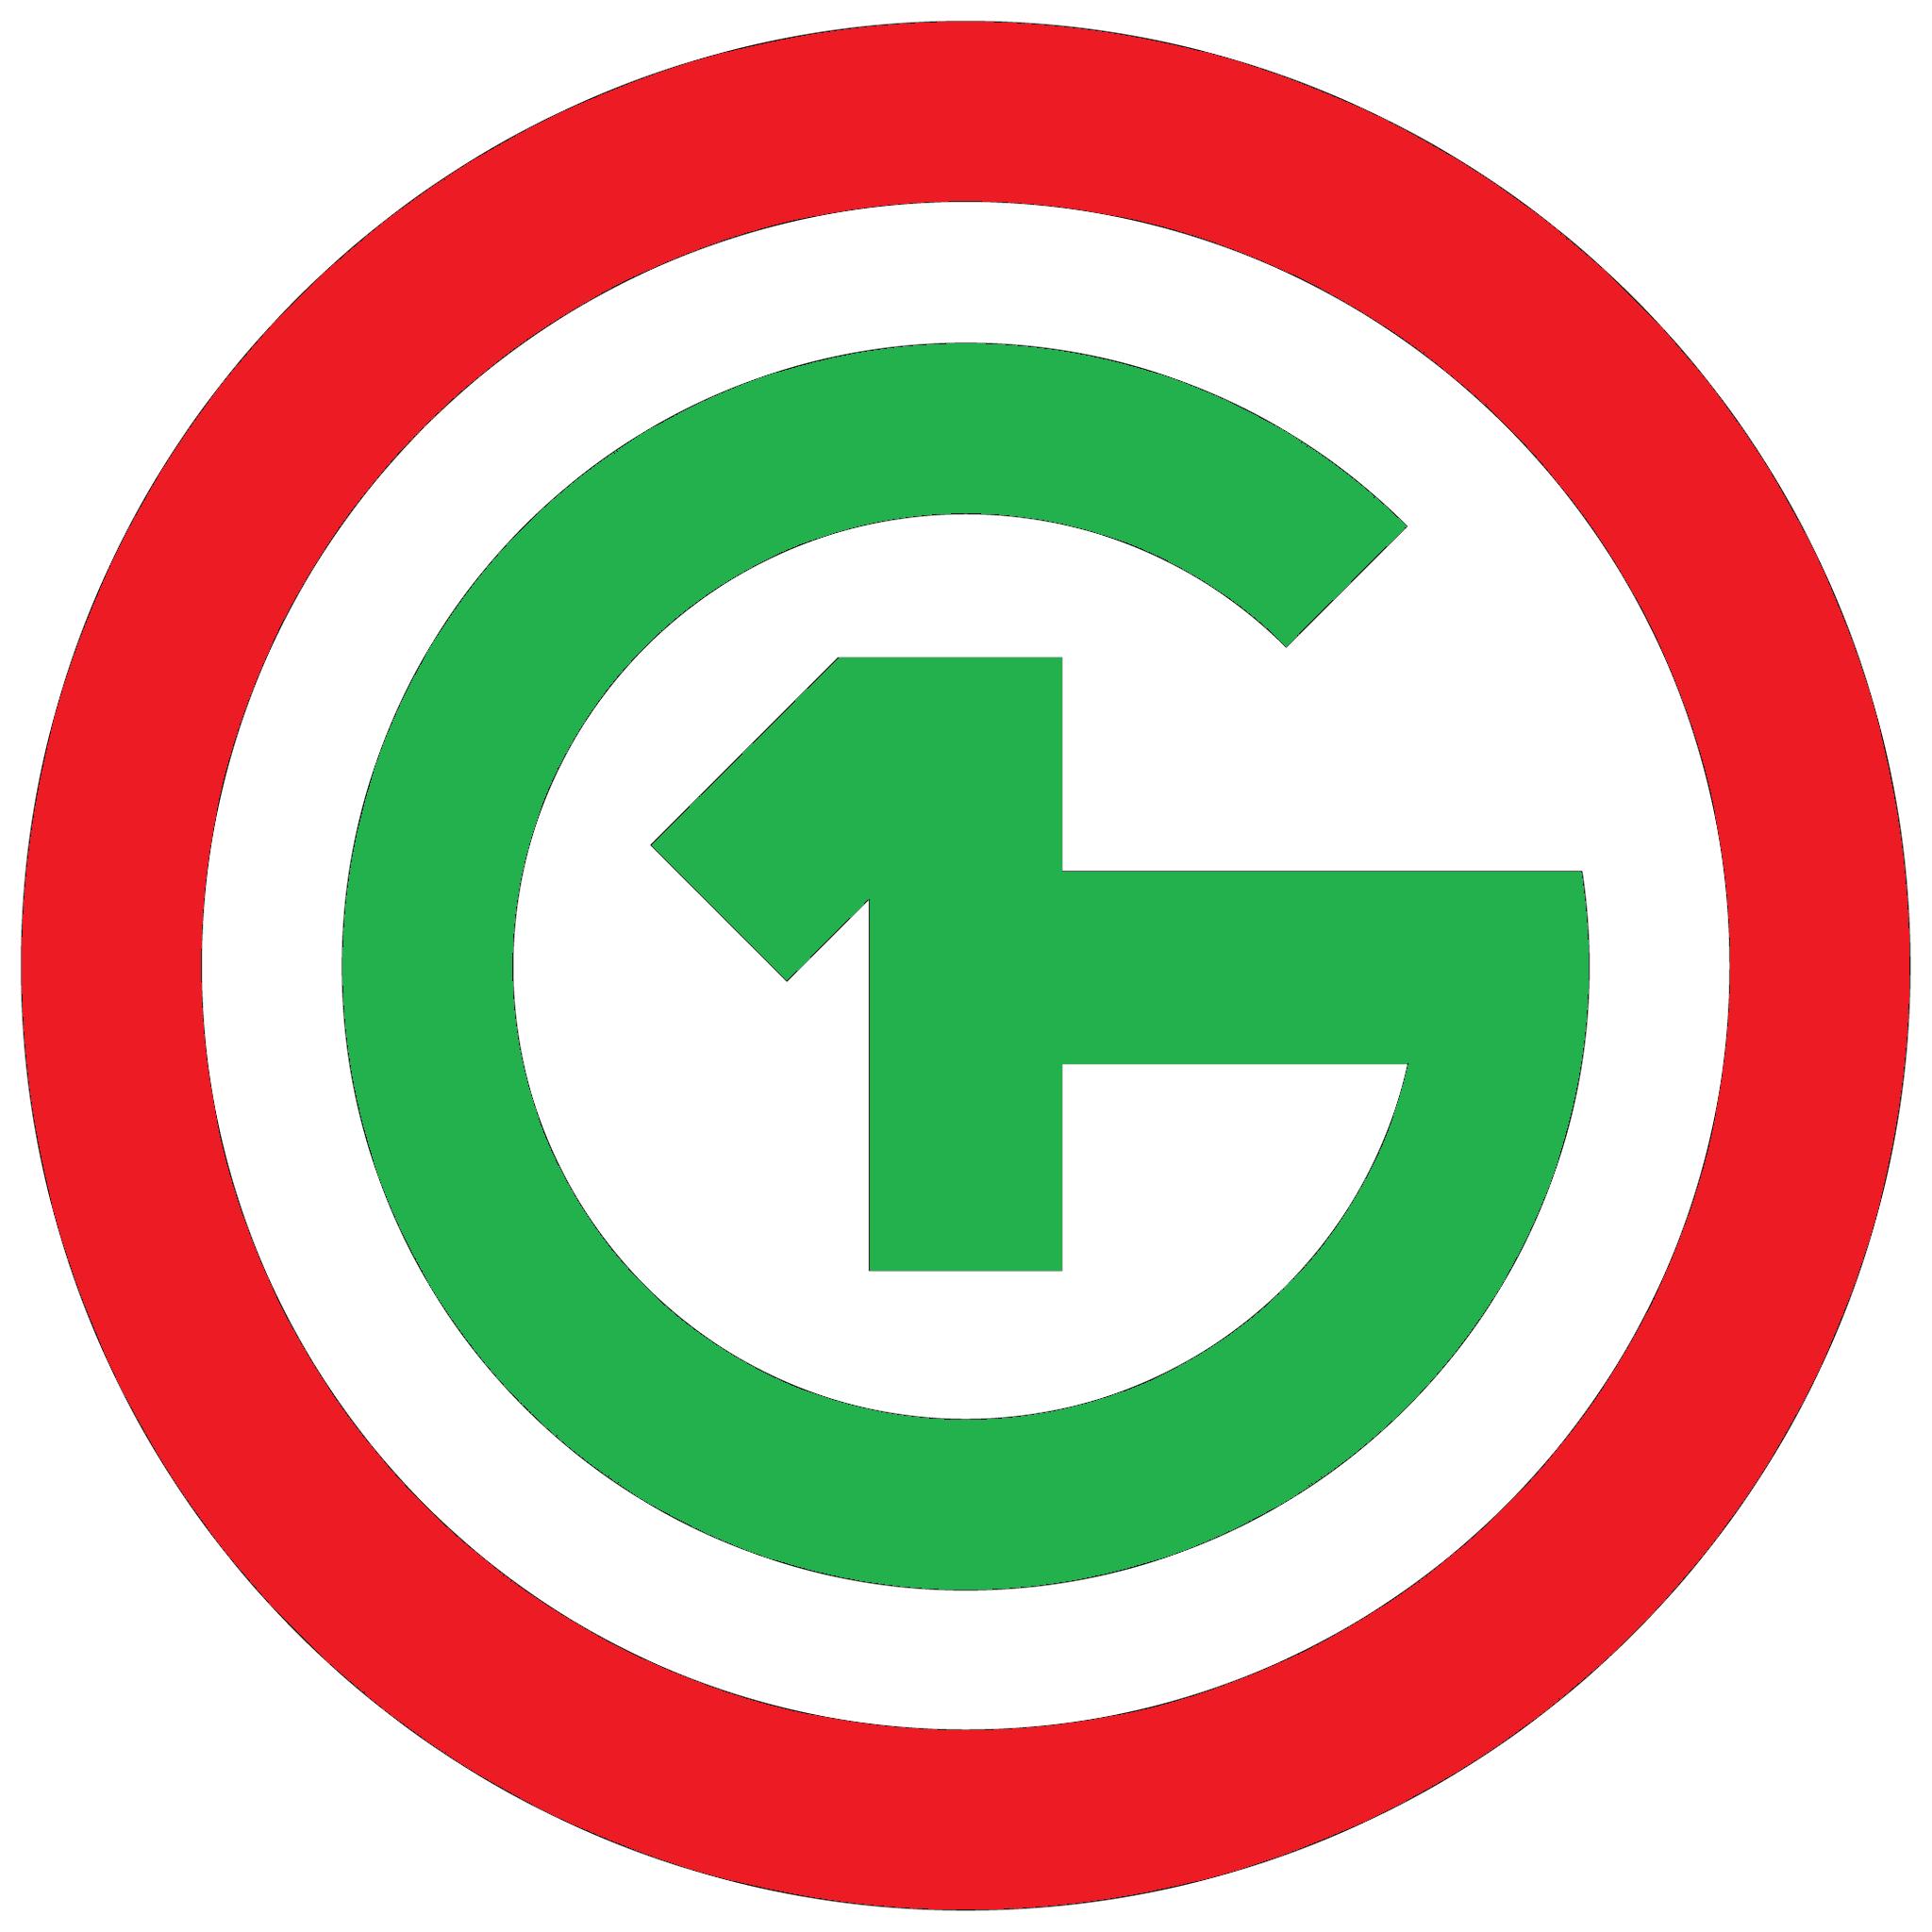 magyar_o1g.png